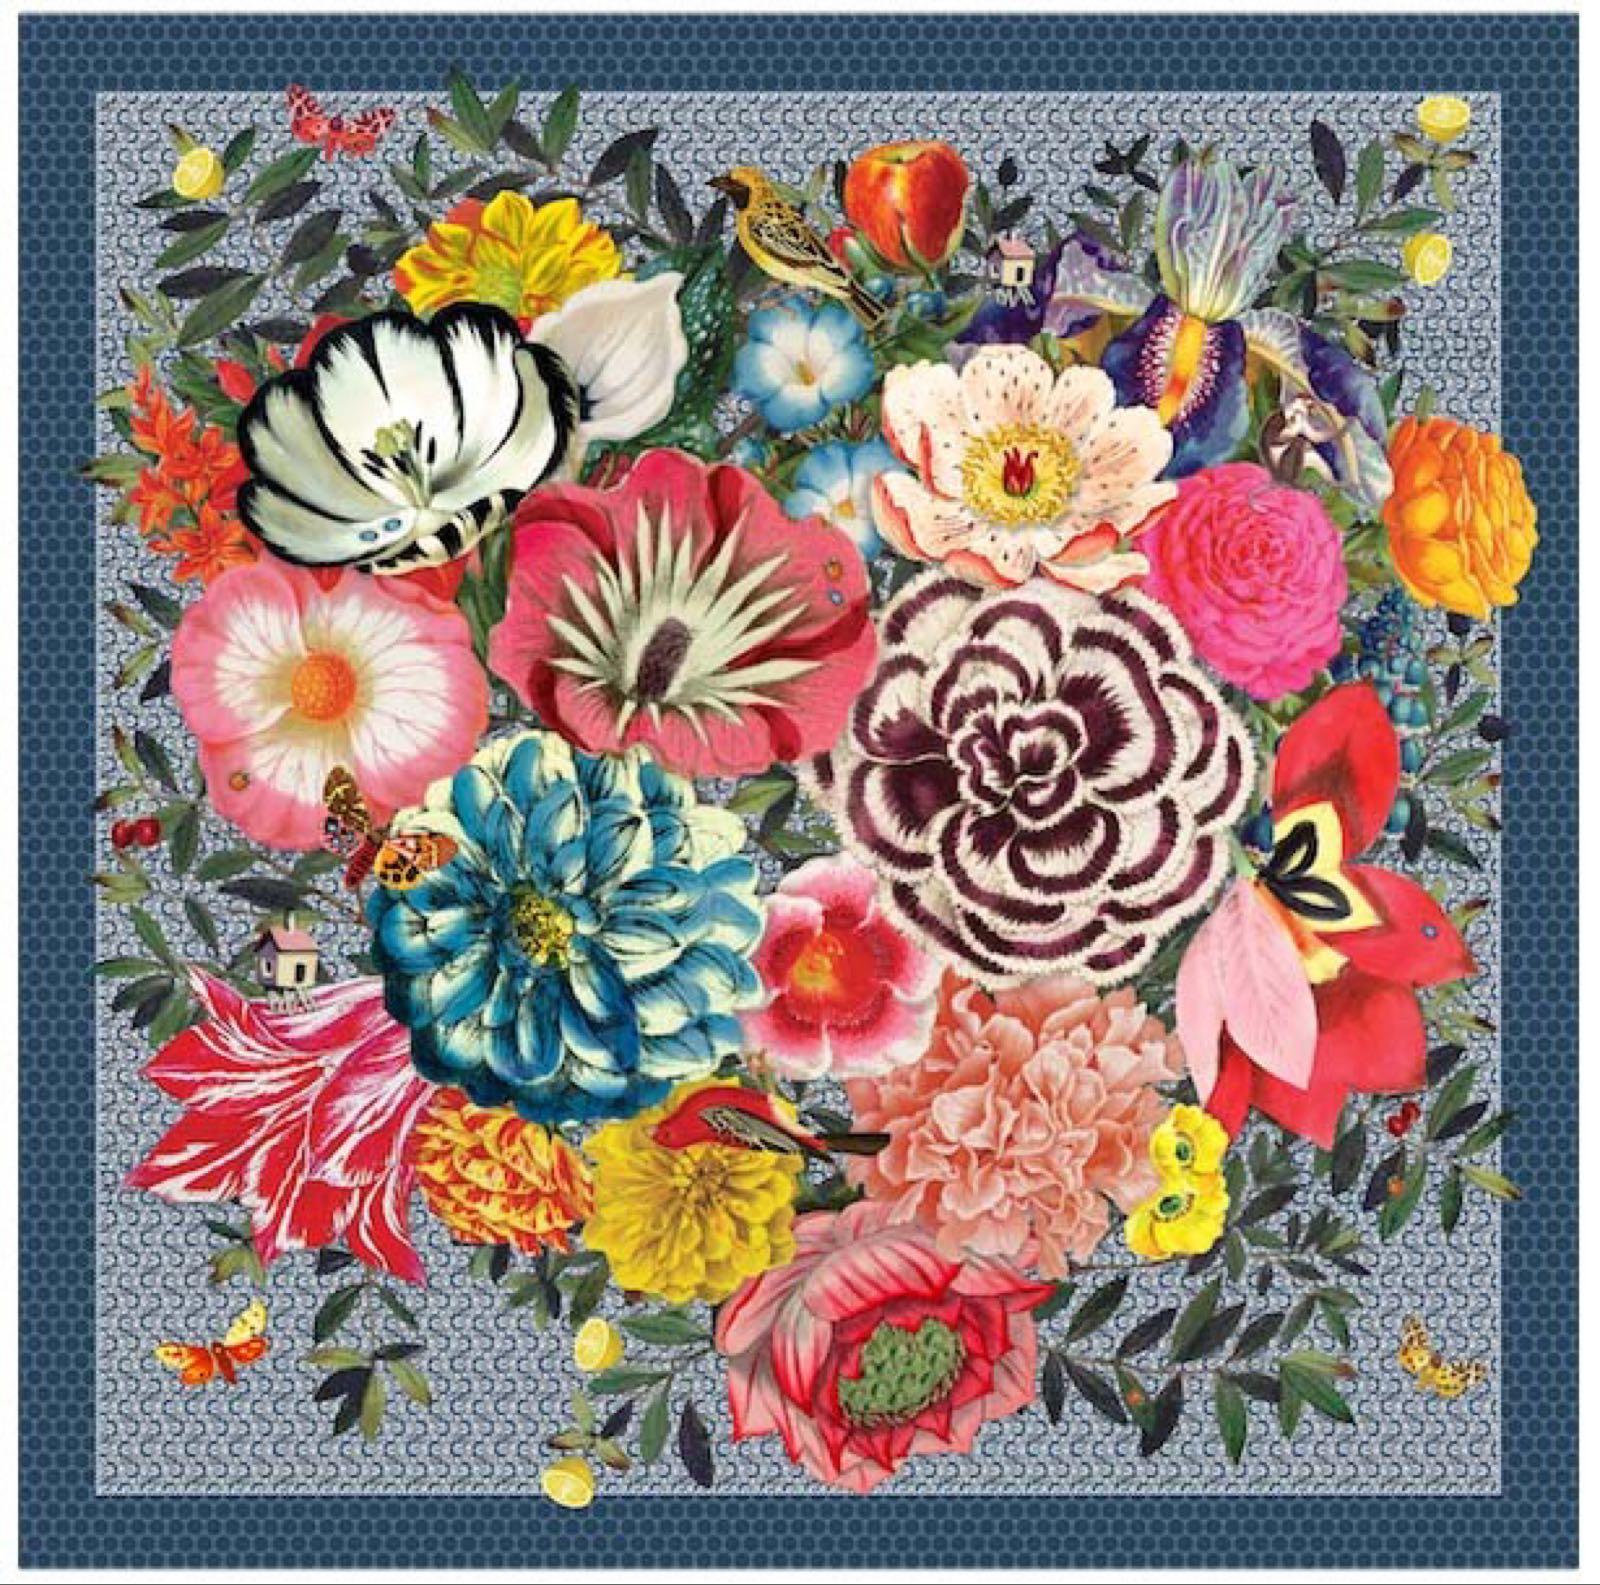 Pip studio Flowers 100% silk scarf